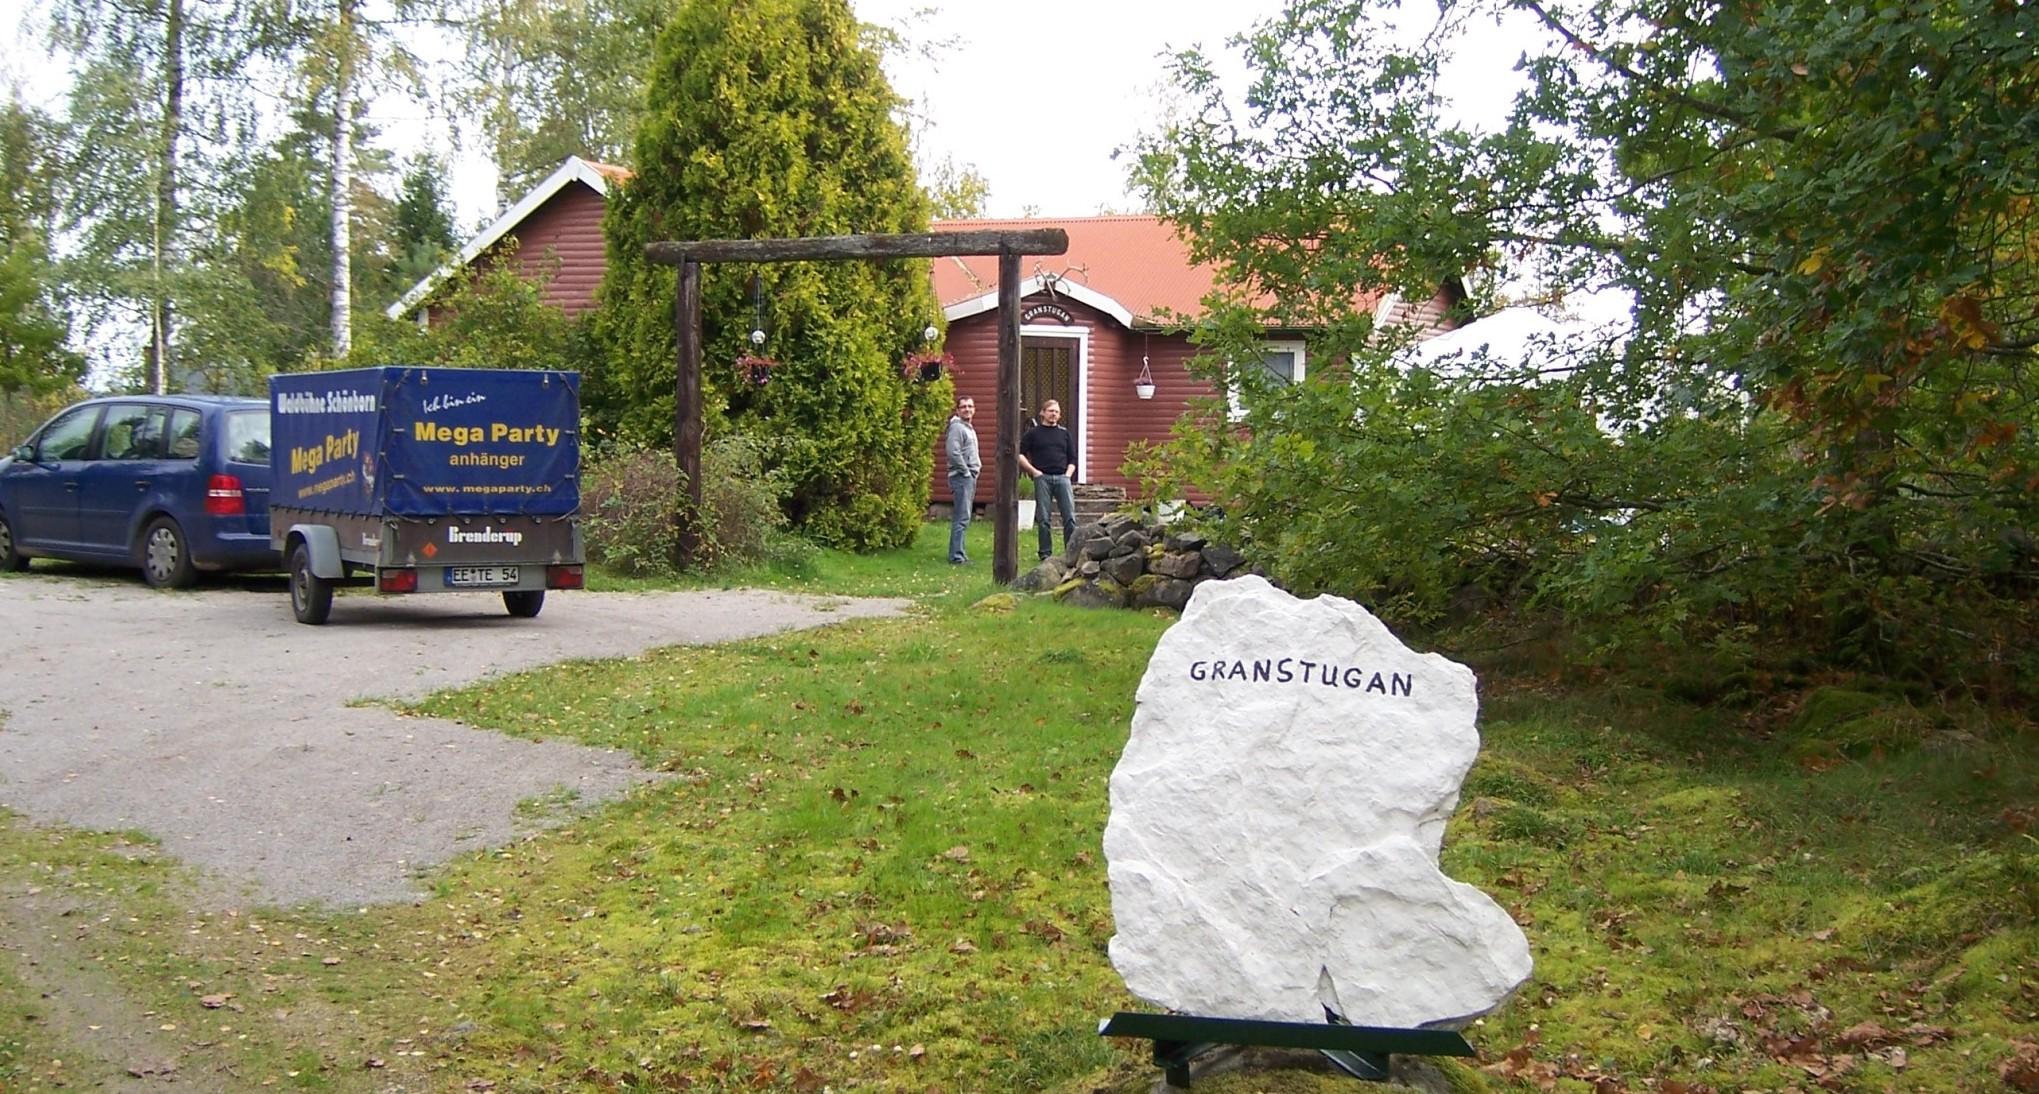 ÅSNEN-TROLLING 2010, Granstugan auf Borgön